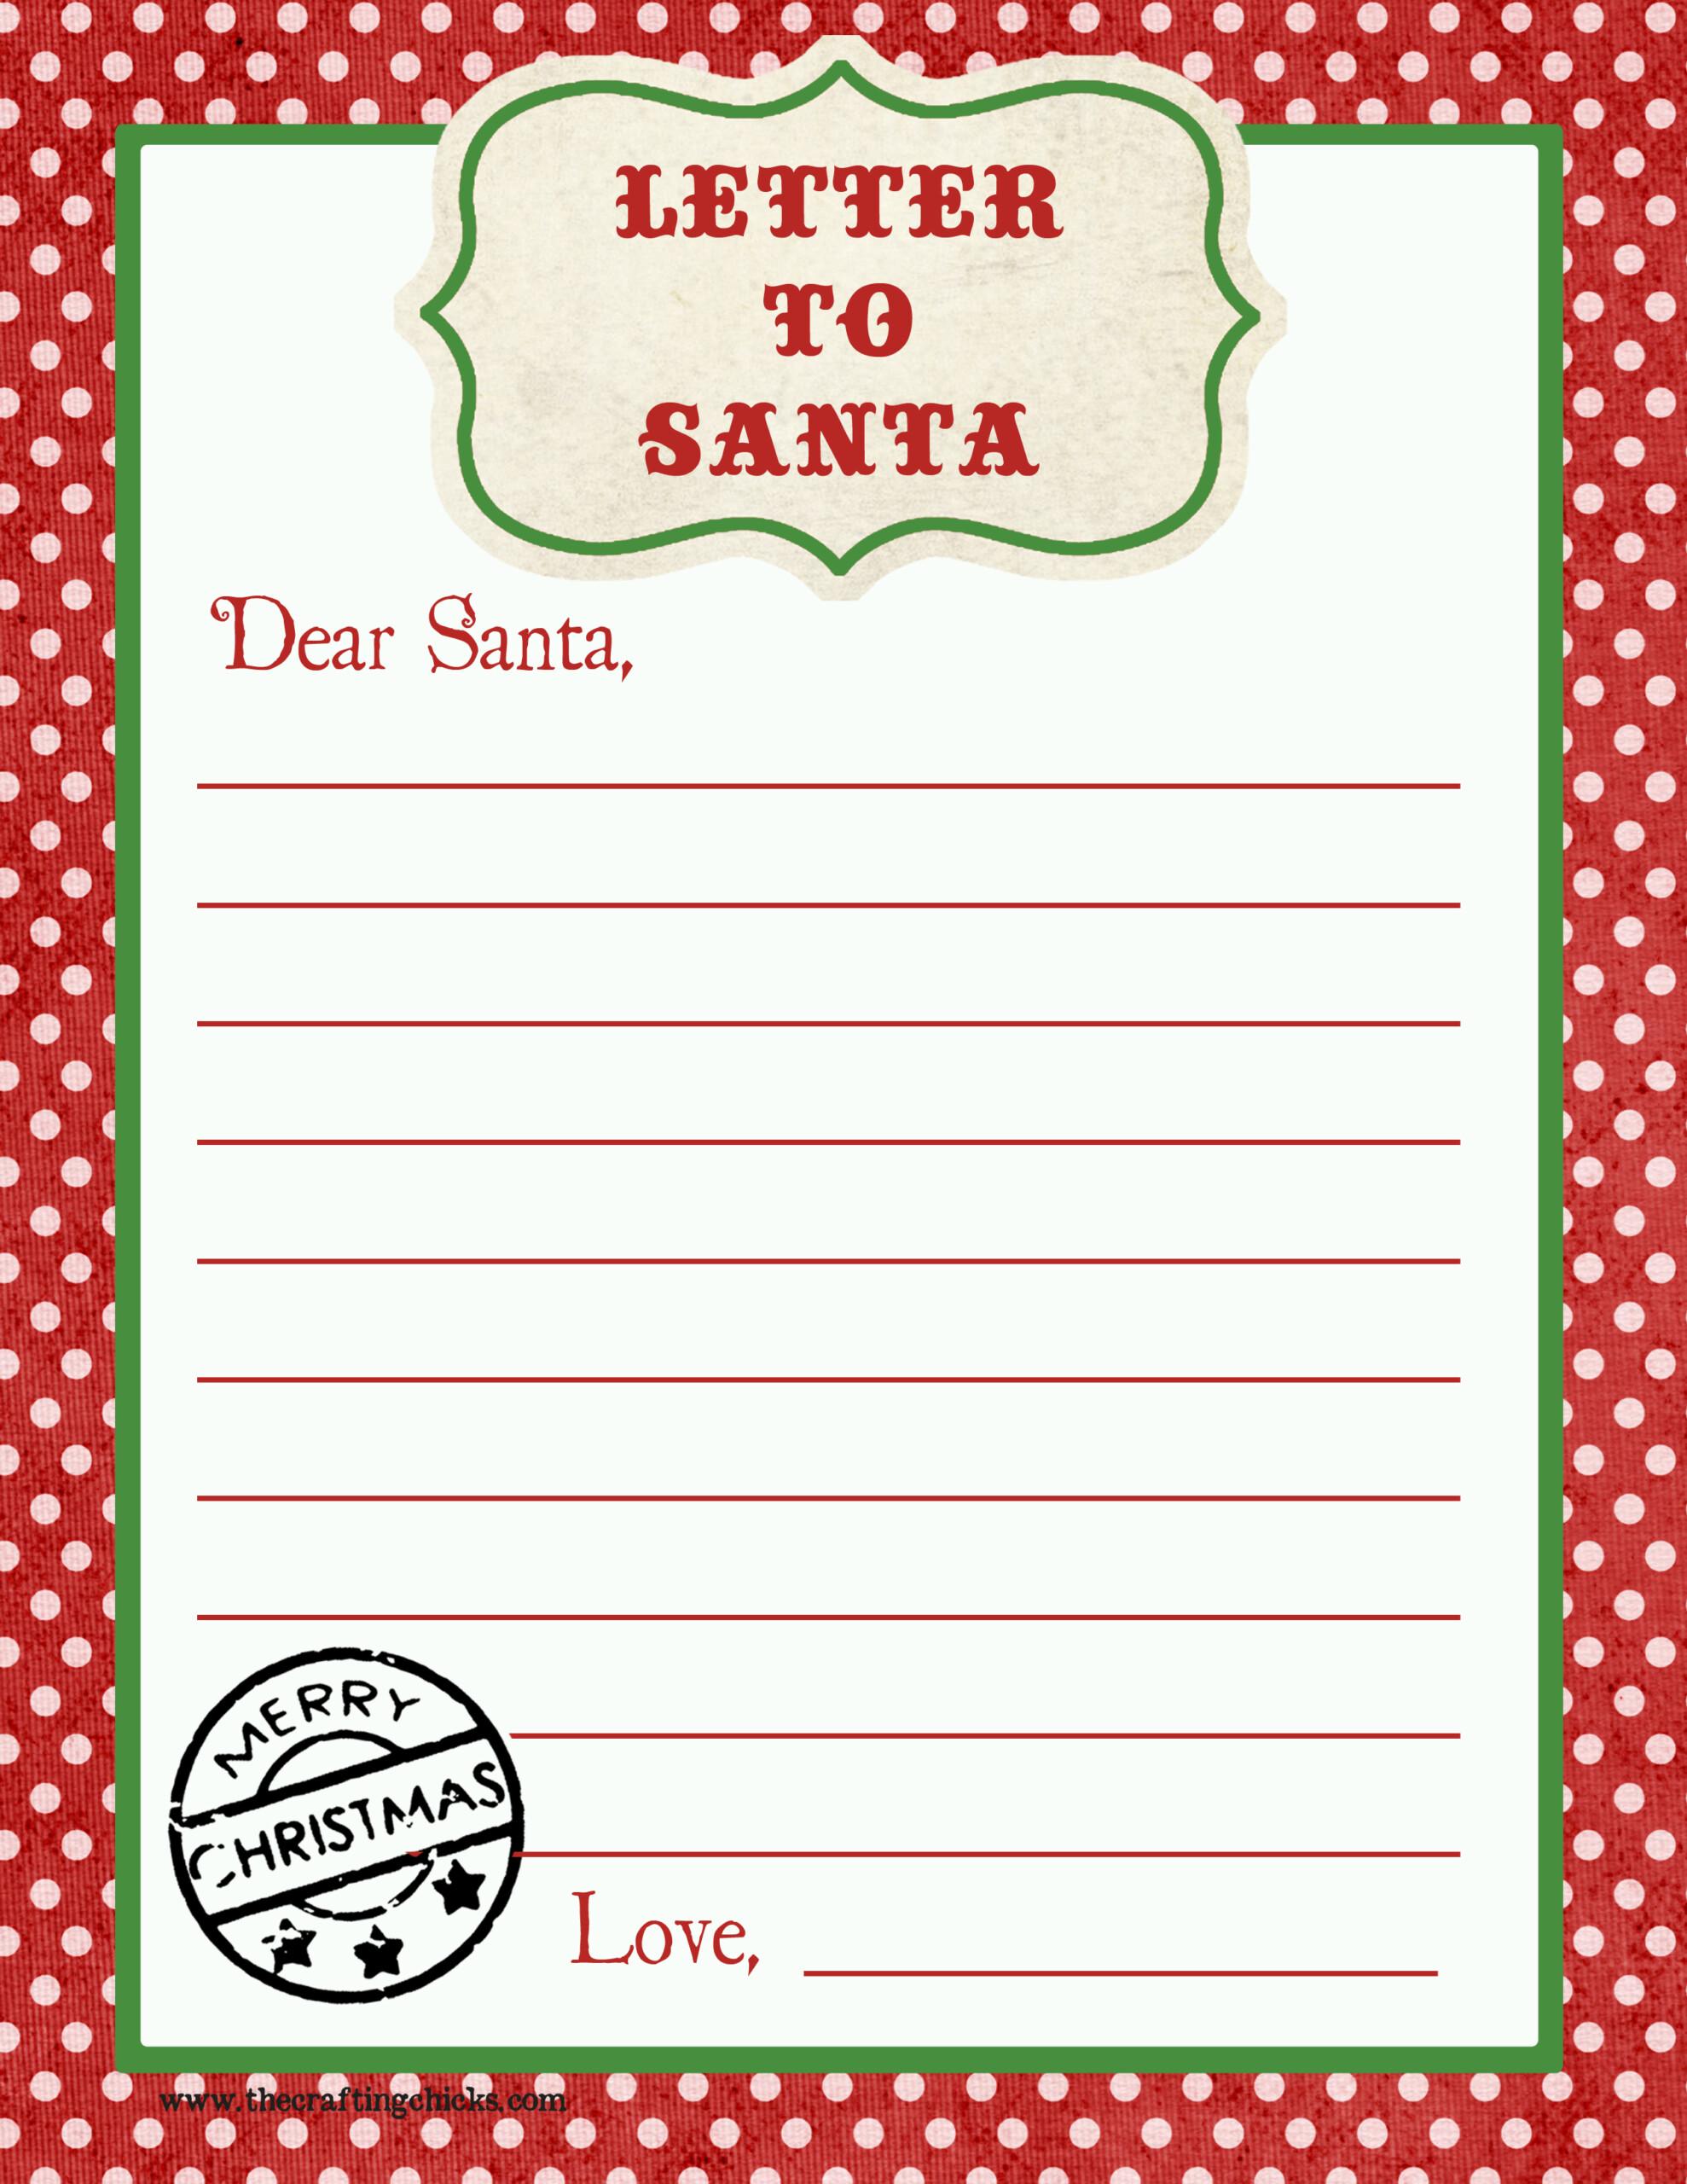 Letter To Santa Free Printable Download